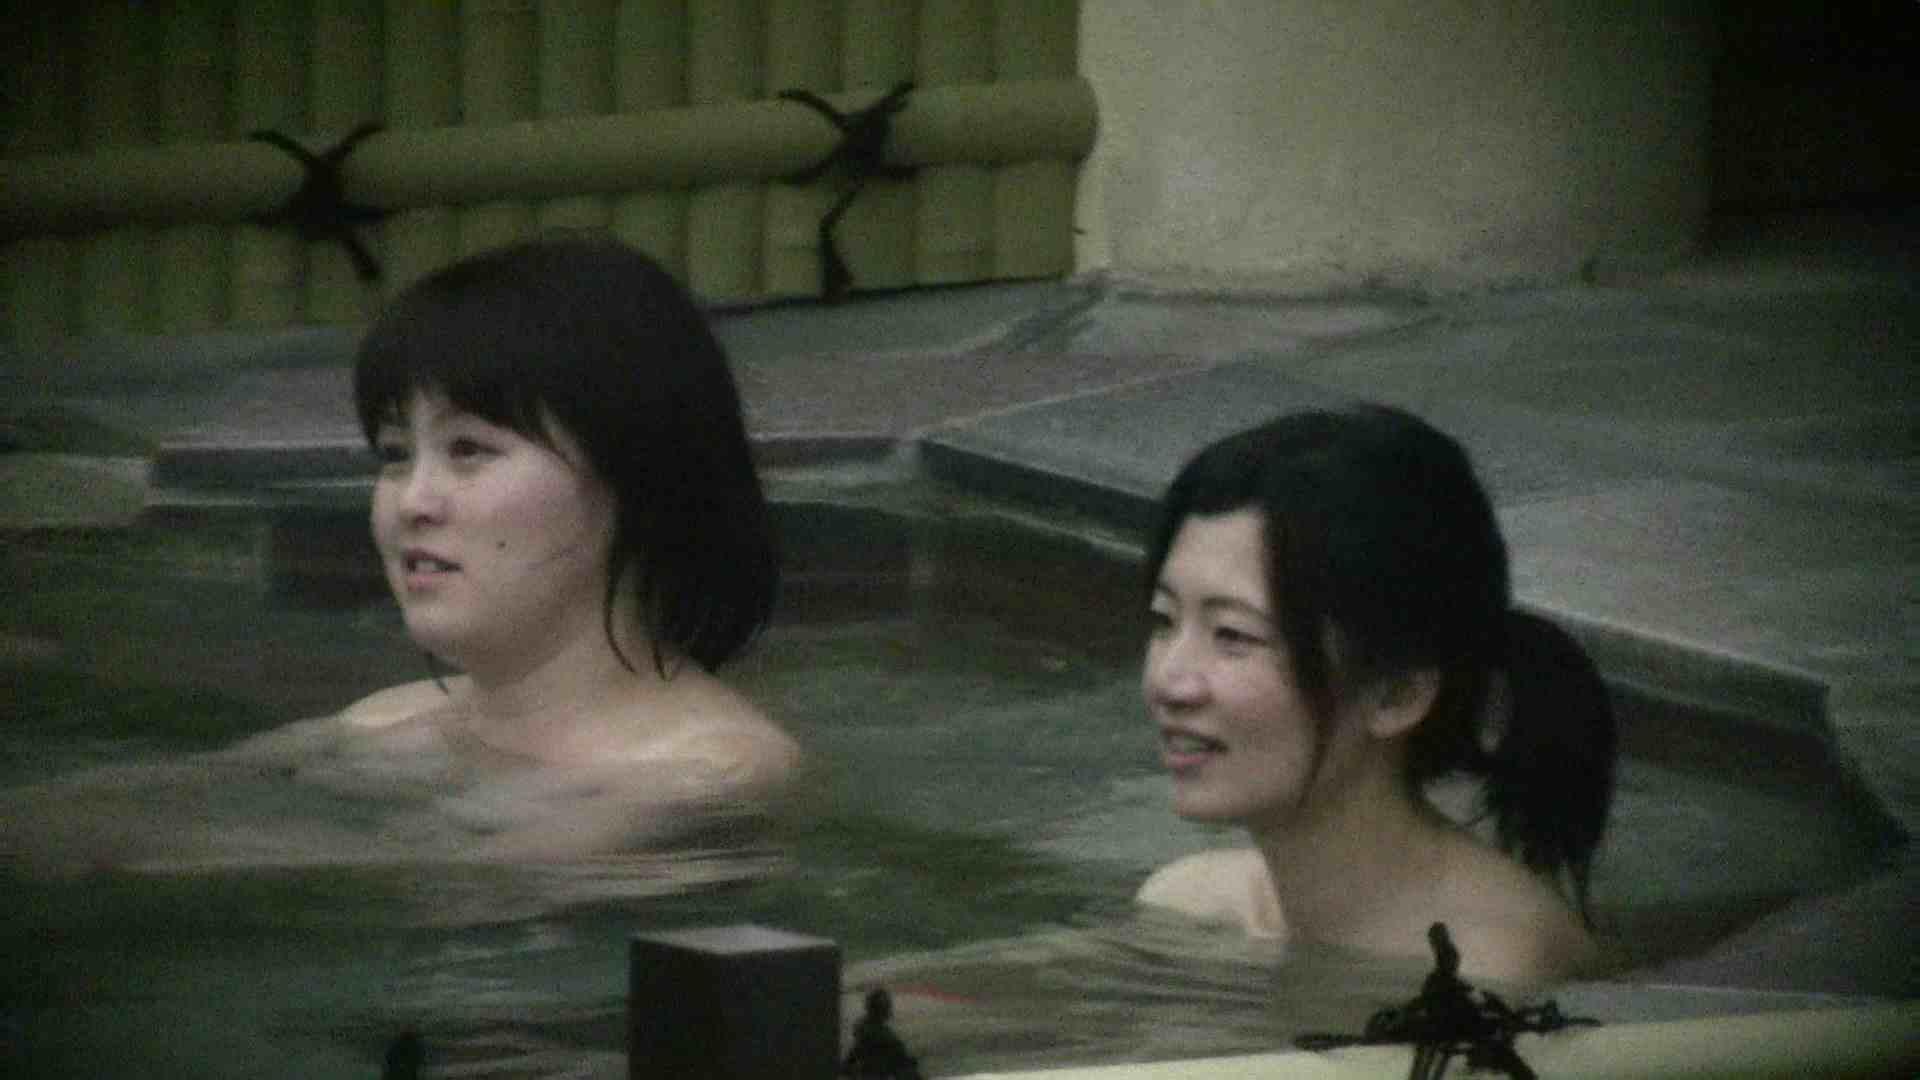 Aquaな露天風呂Vol.539 OL女体  88連発 33